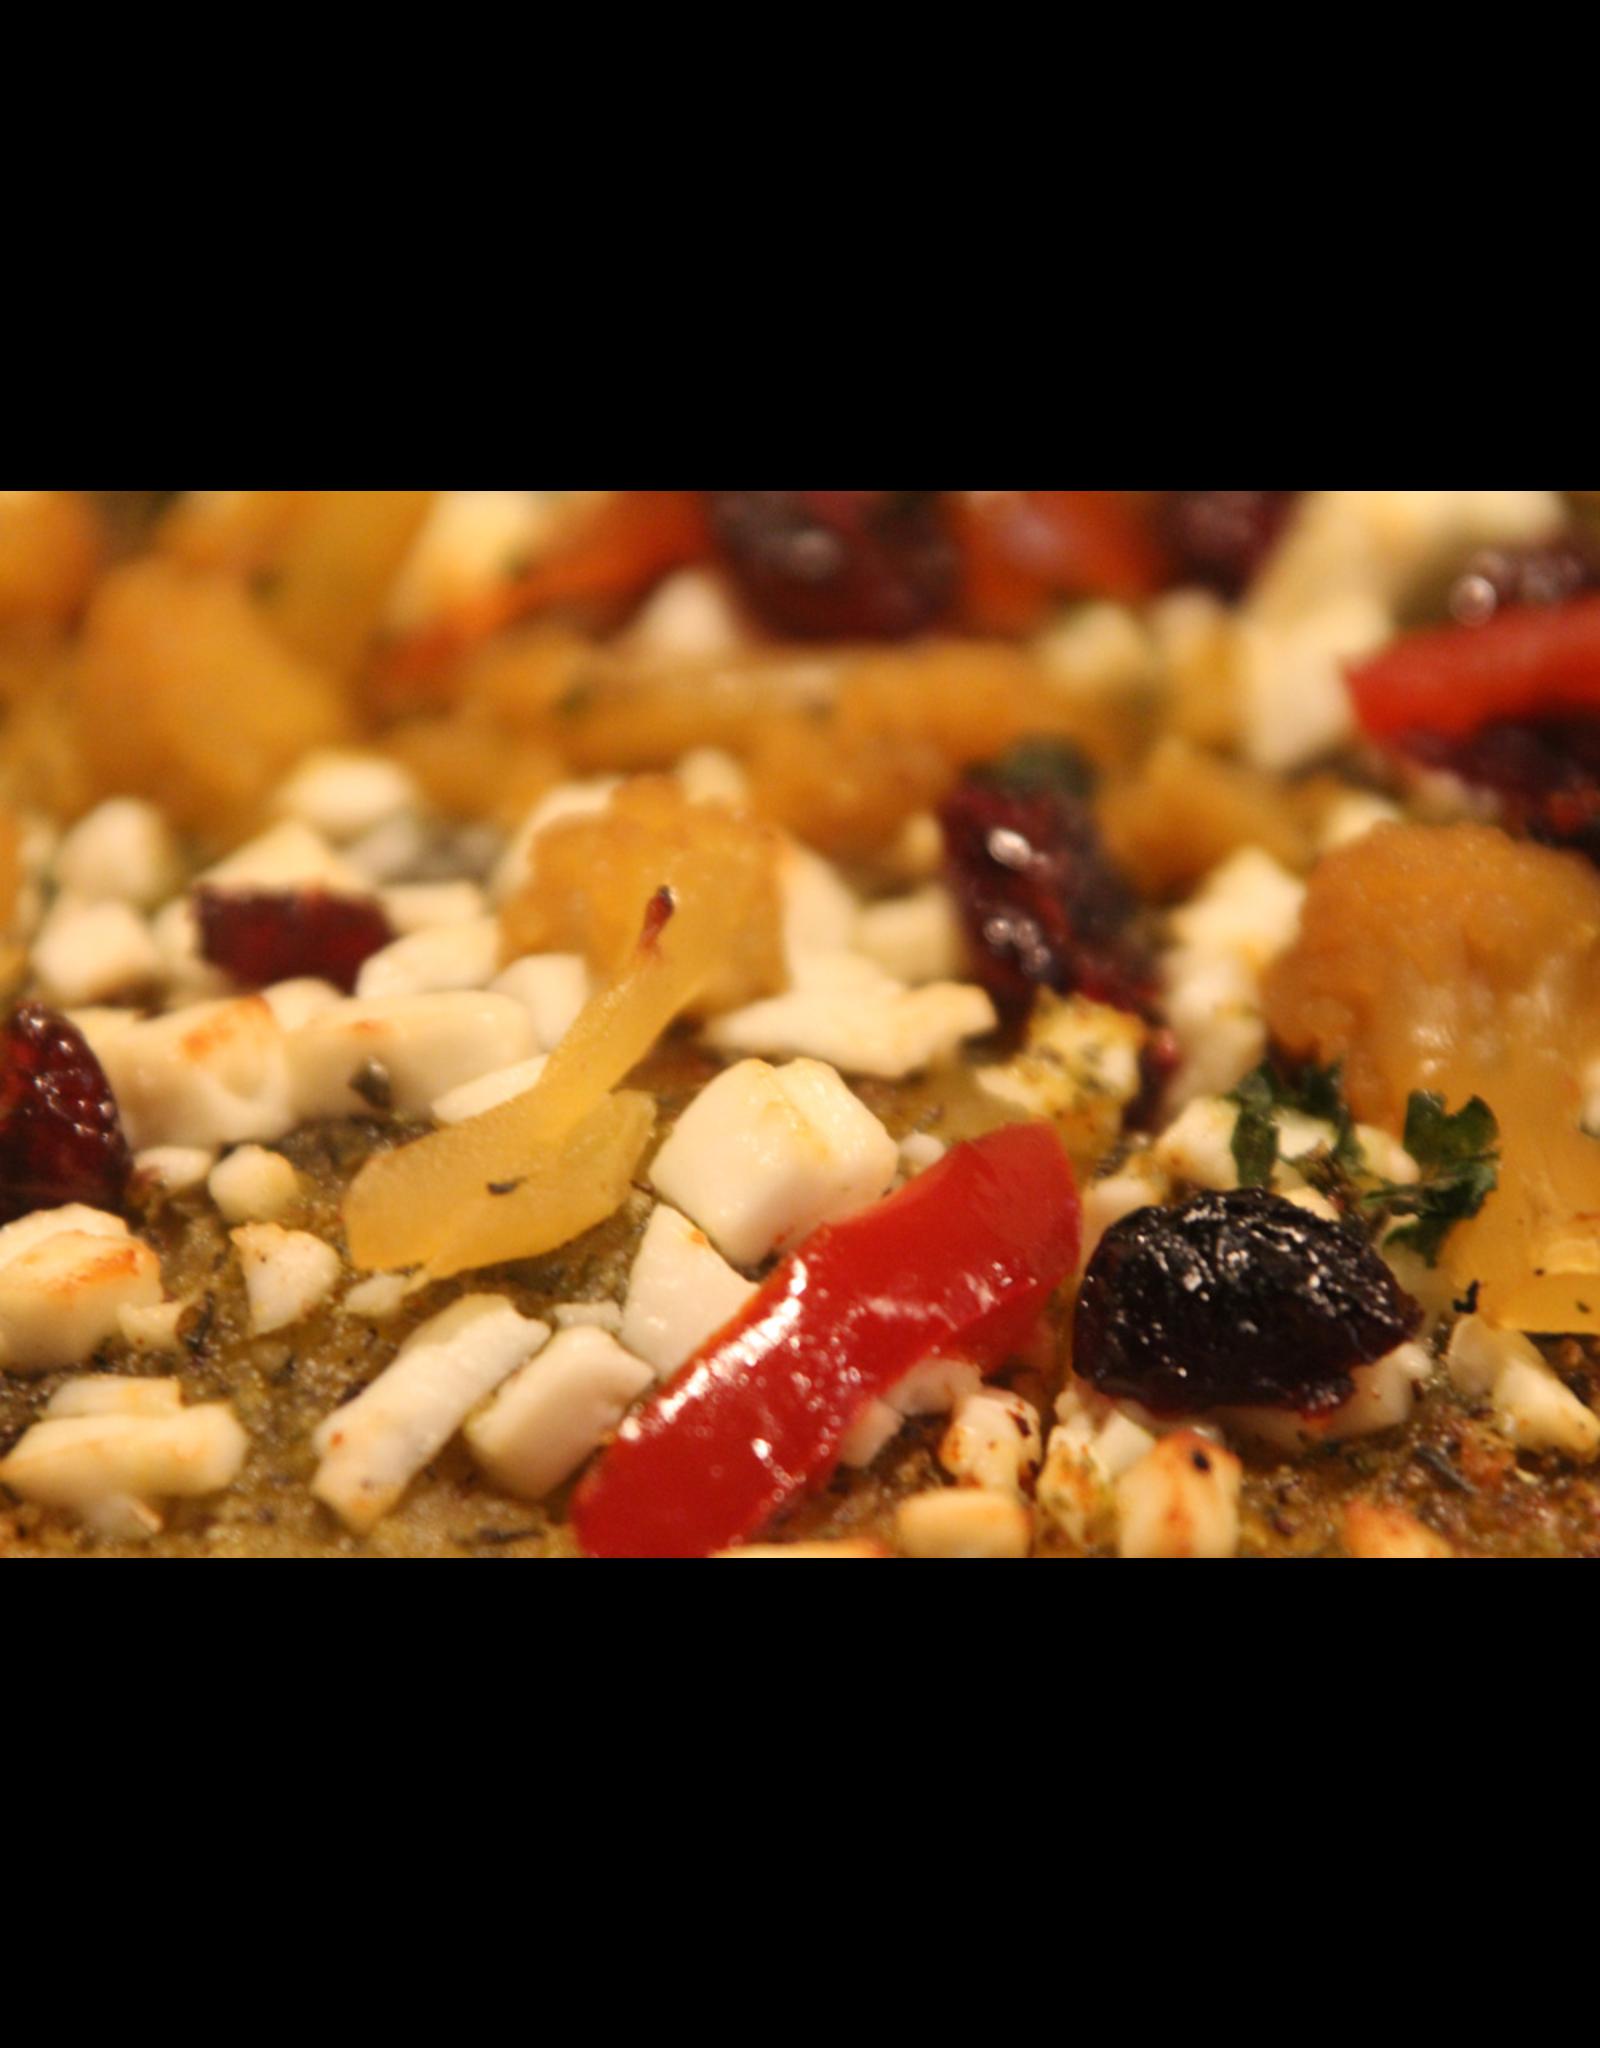 Wine Dining™ TO-GO TO-GO Reserve Eastern Garden ~ Artisan Neapolitan Style Gourmet Pizza